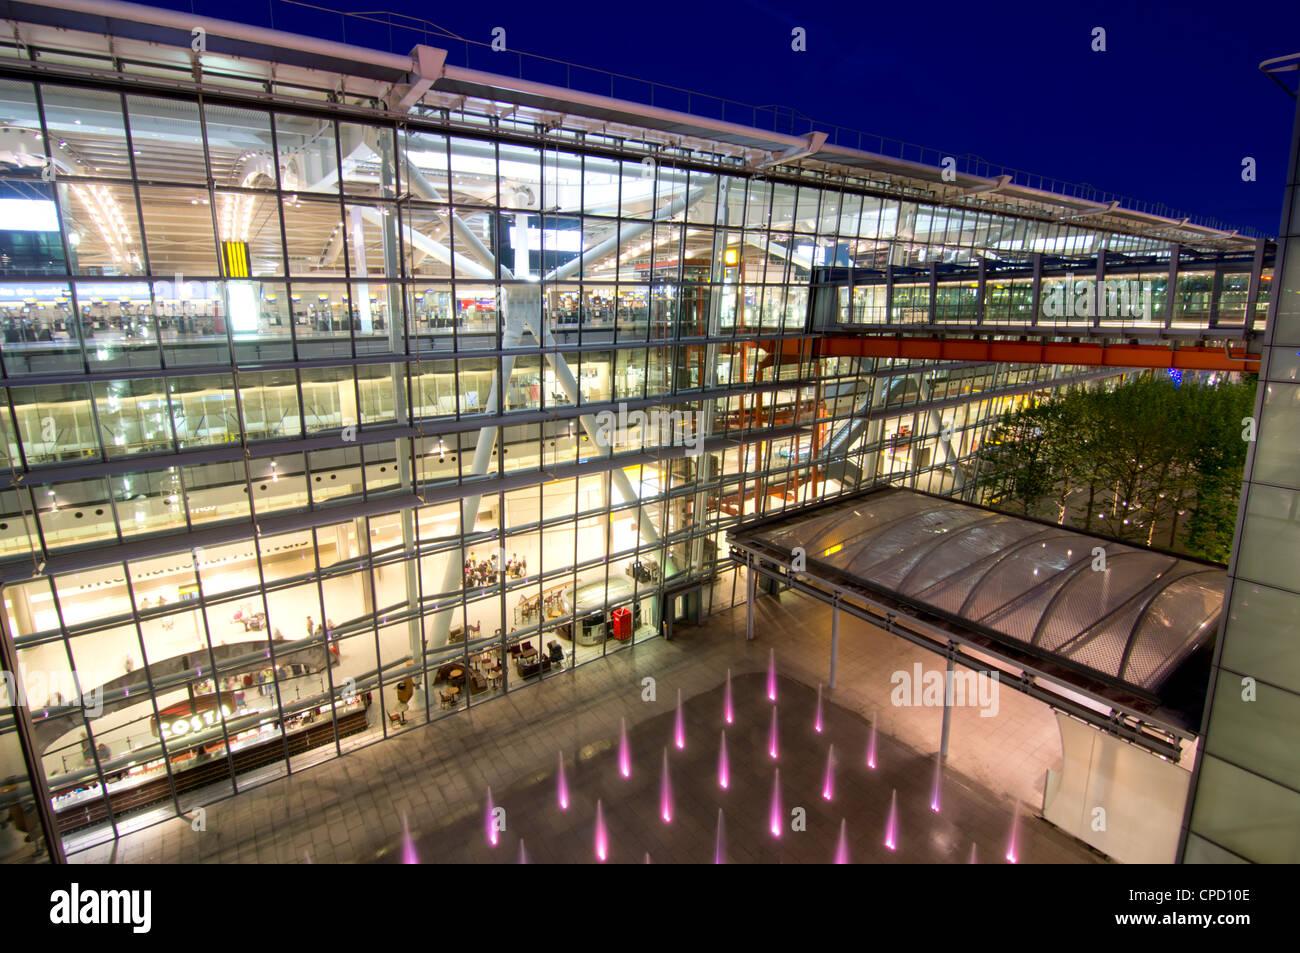 Heathrow Airport Terminal 5 building at dusk, London, England, United Kingdom, Europe - Stock Image